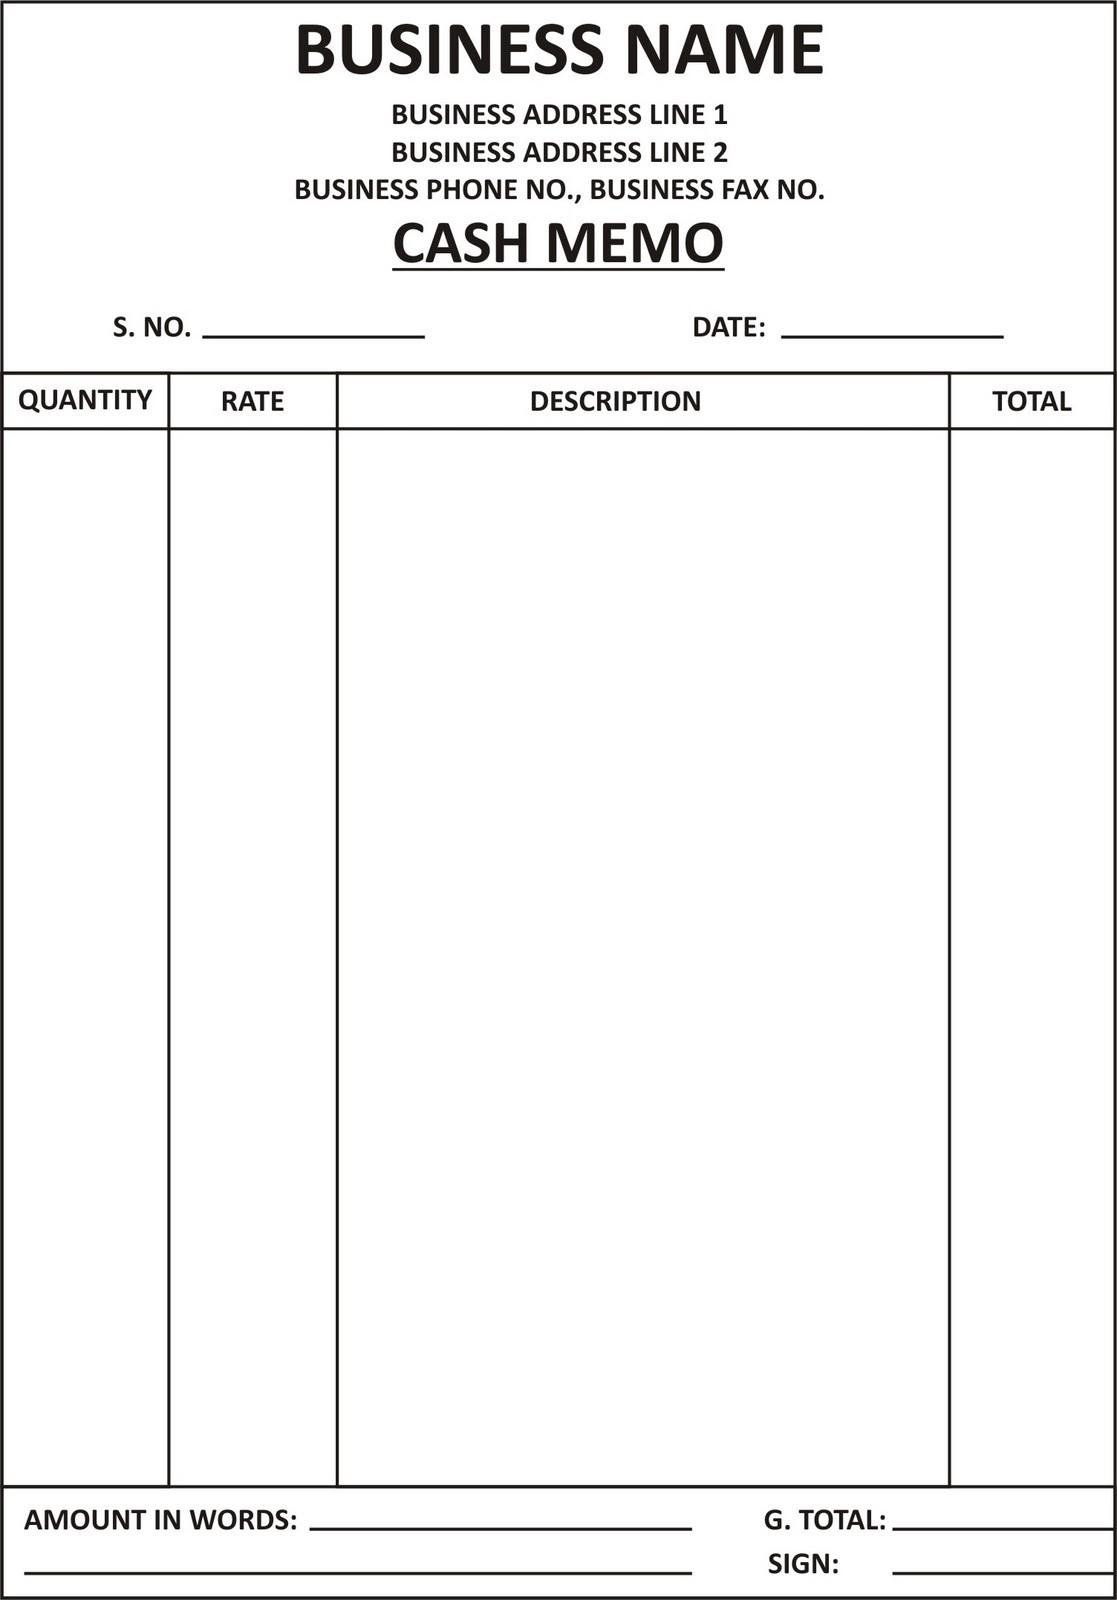 cash memo and invoise web sarfas cash memo and invoise